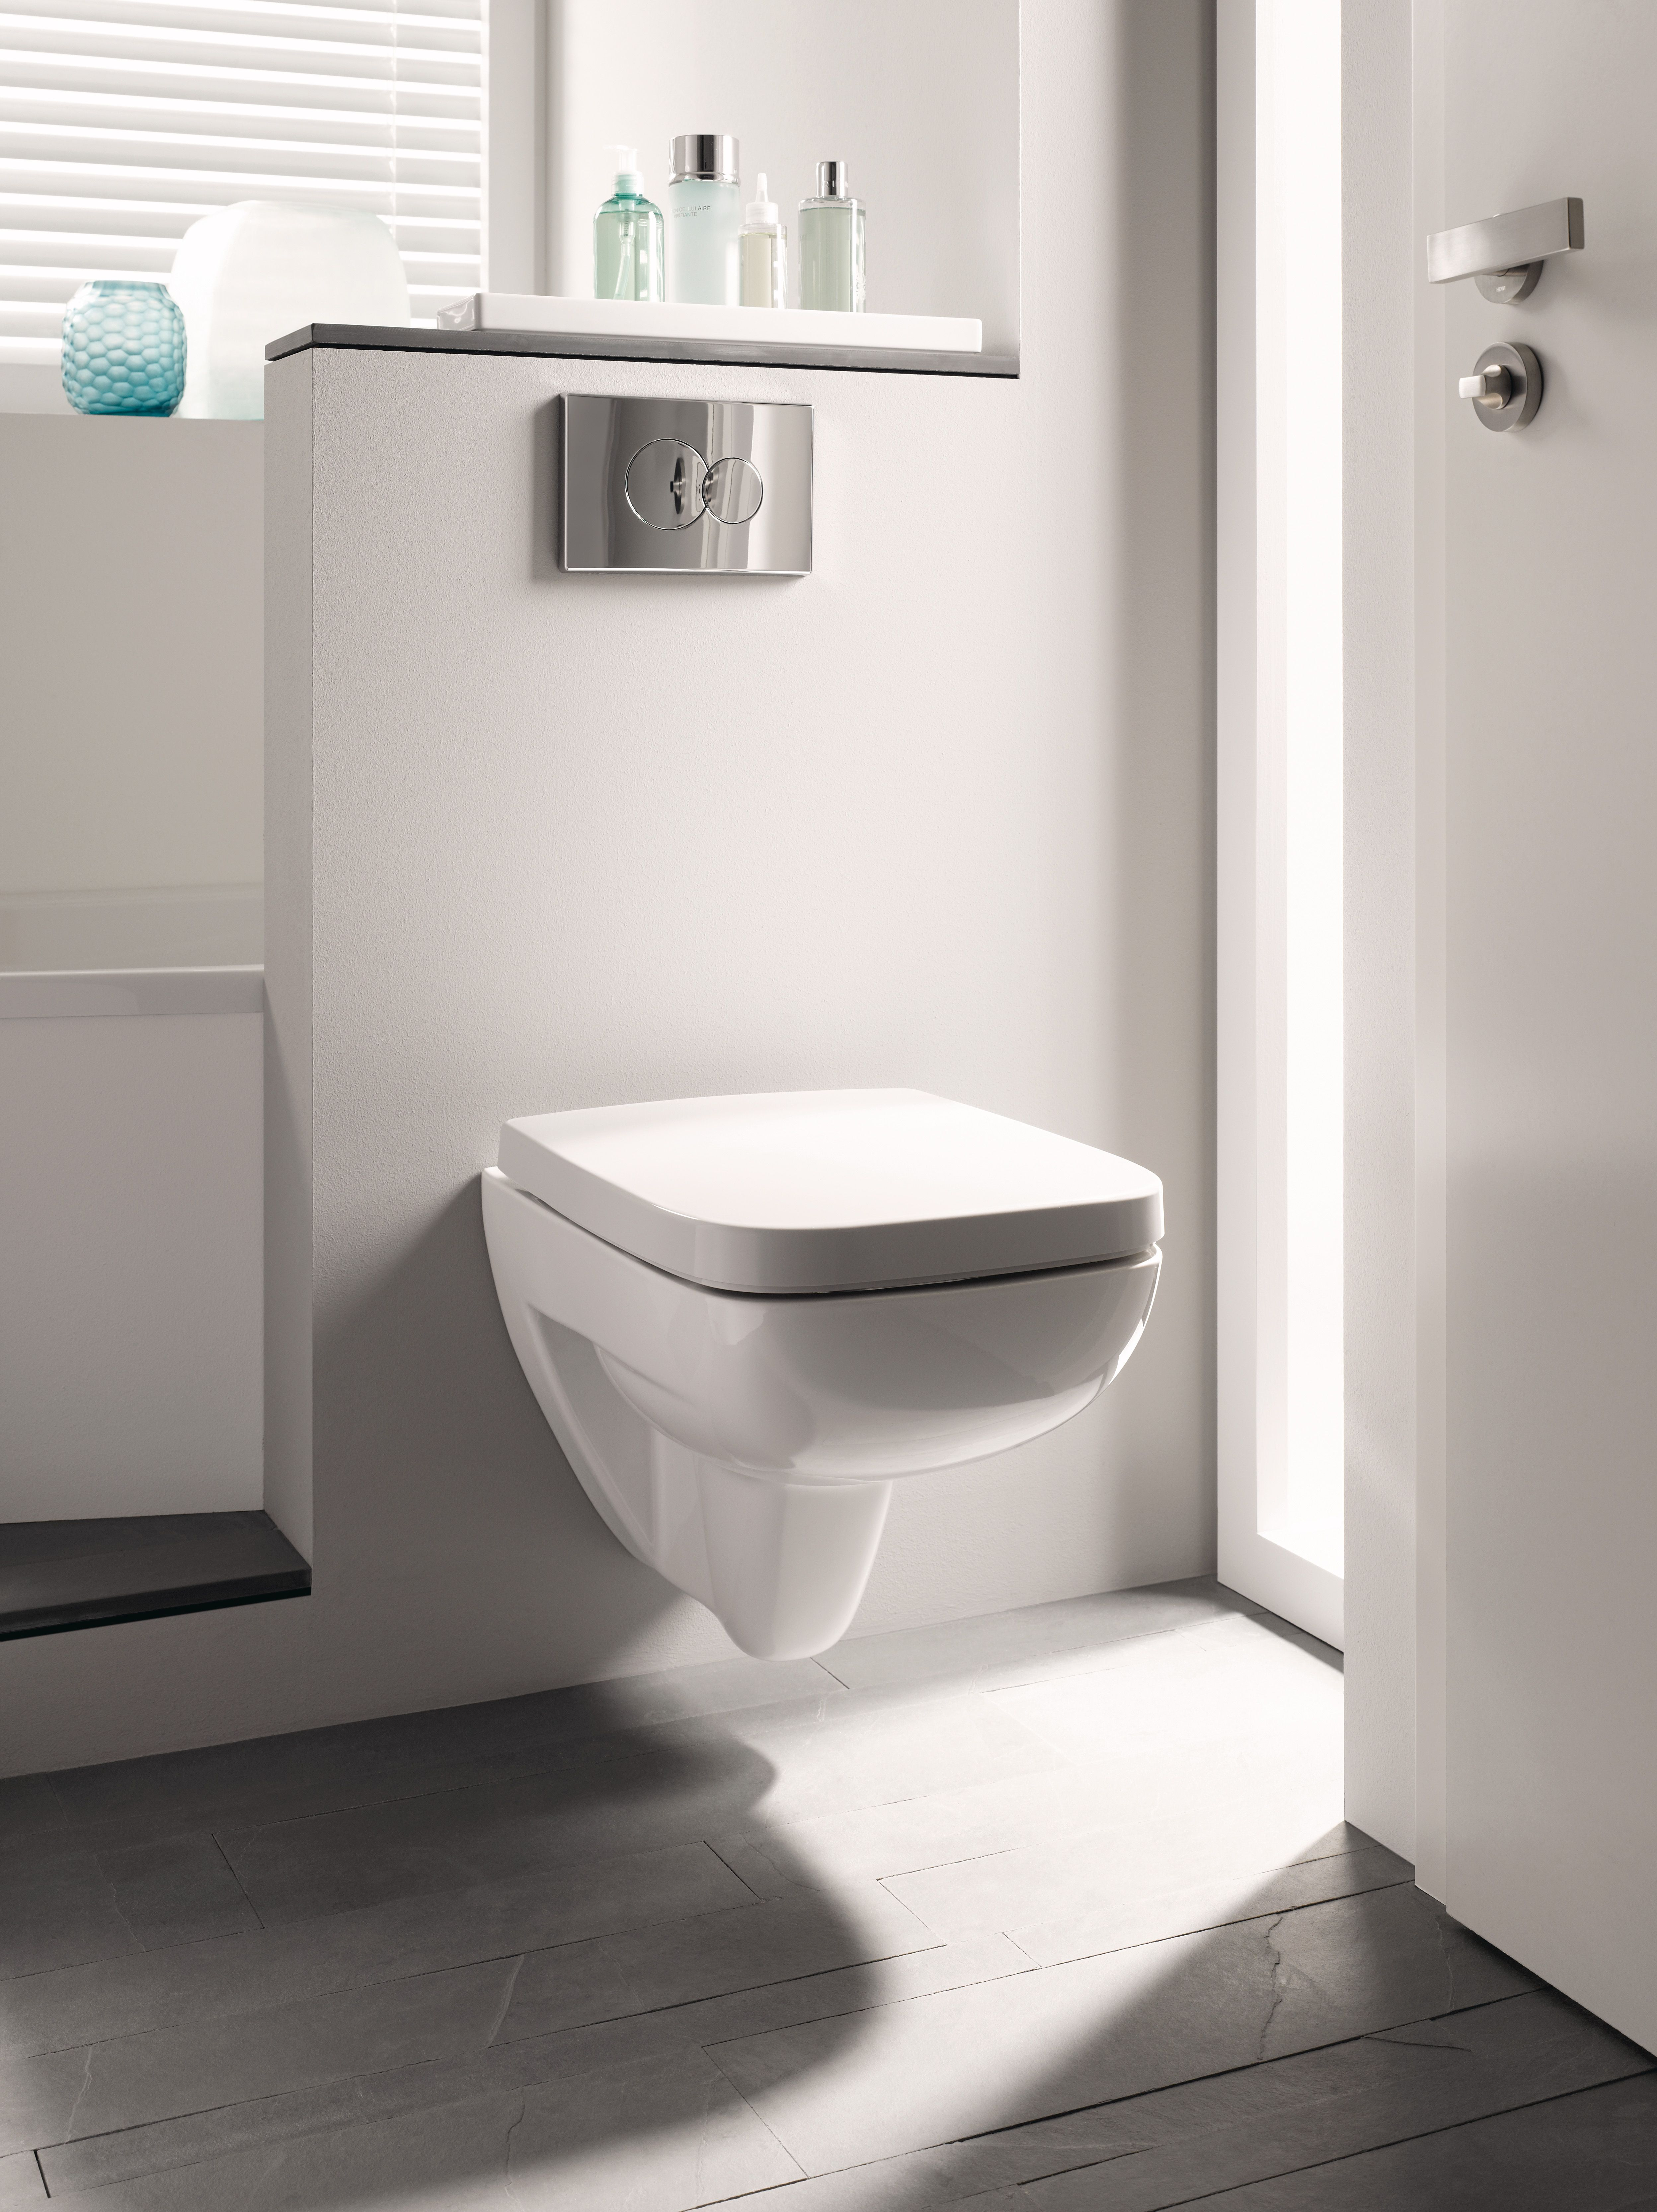 toilet sfinx] - 100 images - sphinx rimfree wandcloset ...